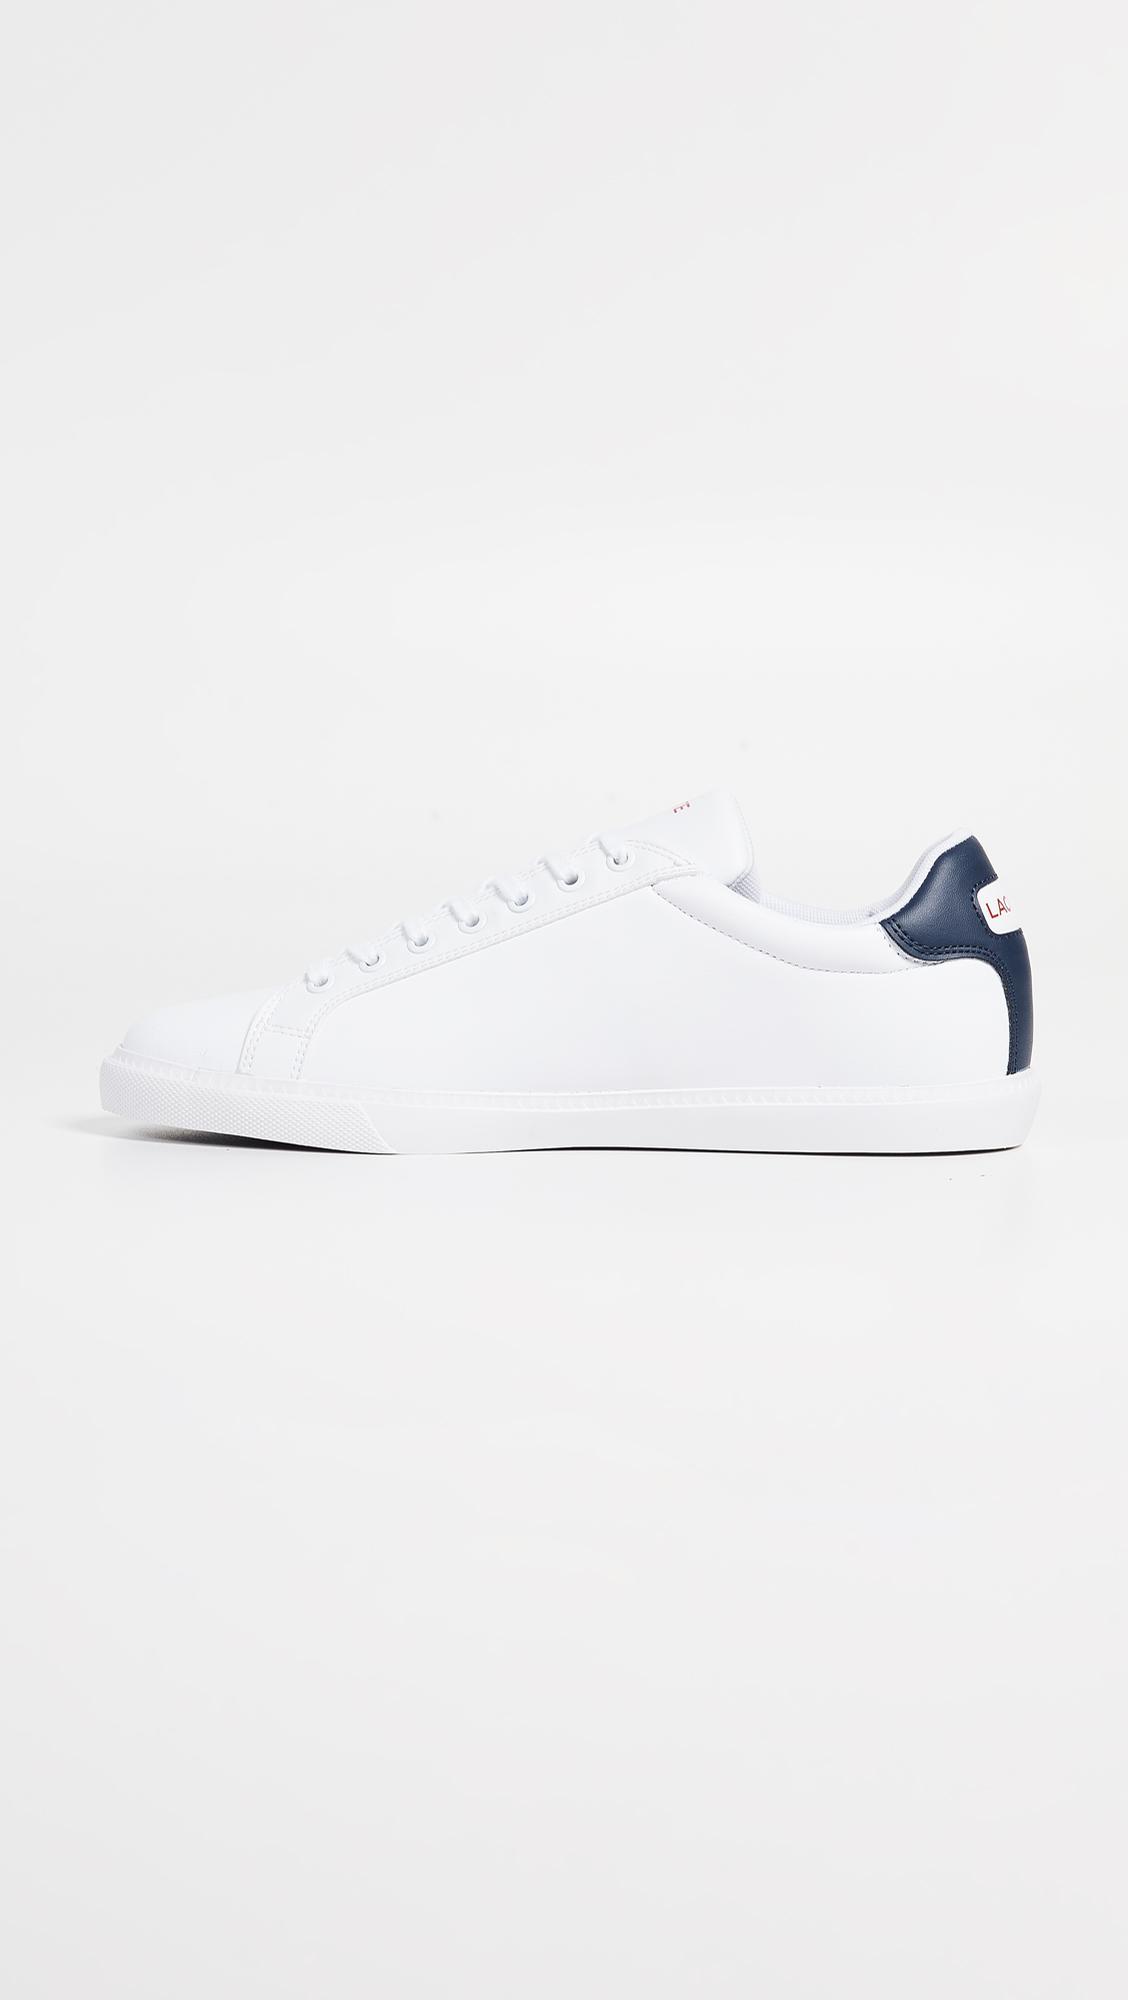 25a40e1b73459 Lacoste - White Grand Vulc Tennis Sneakers for Men - Lyst. View fullscreen